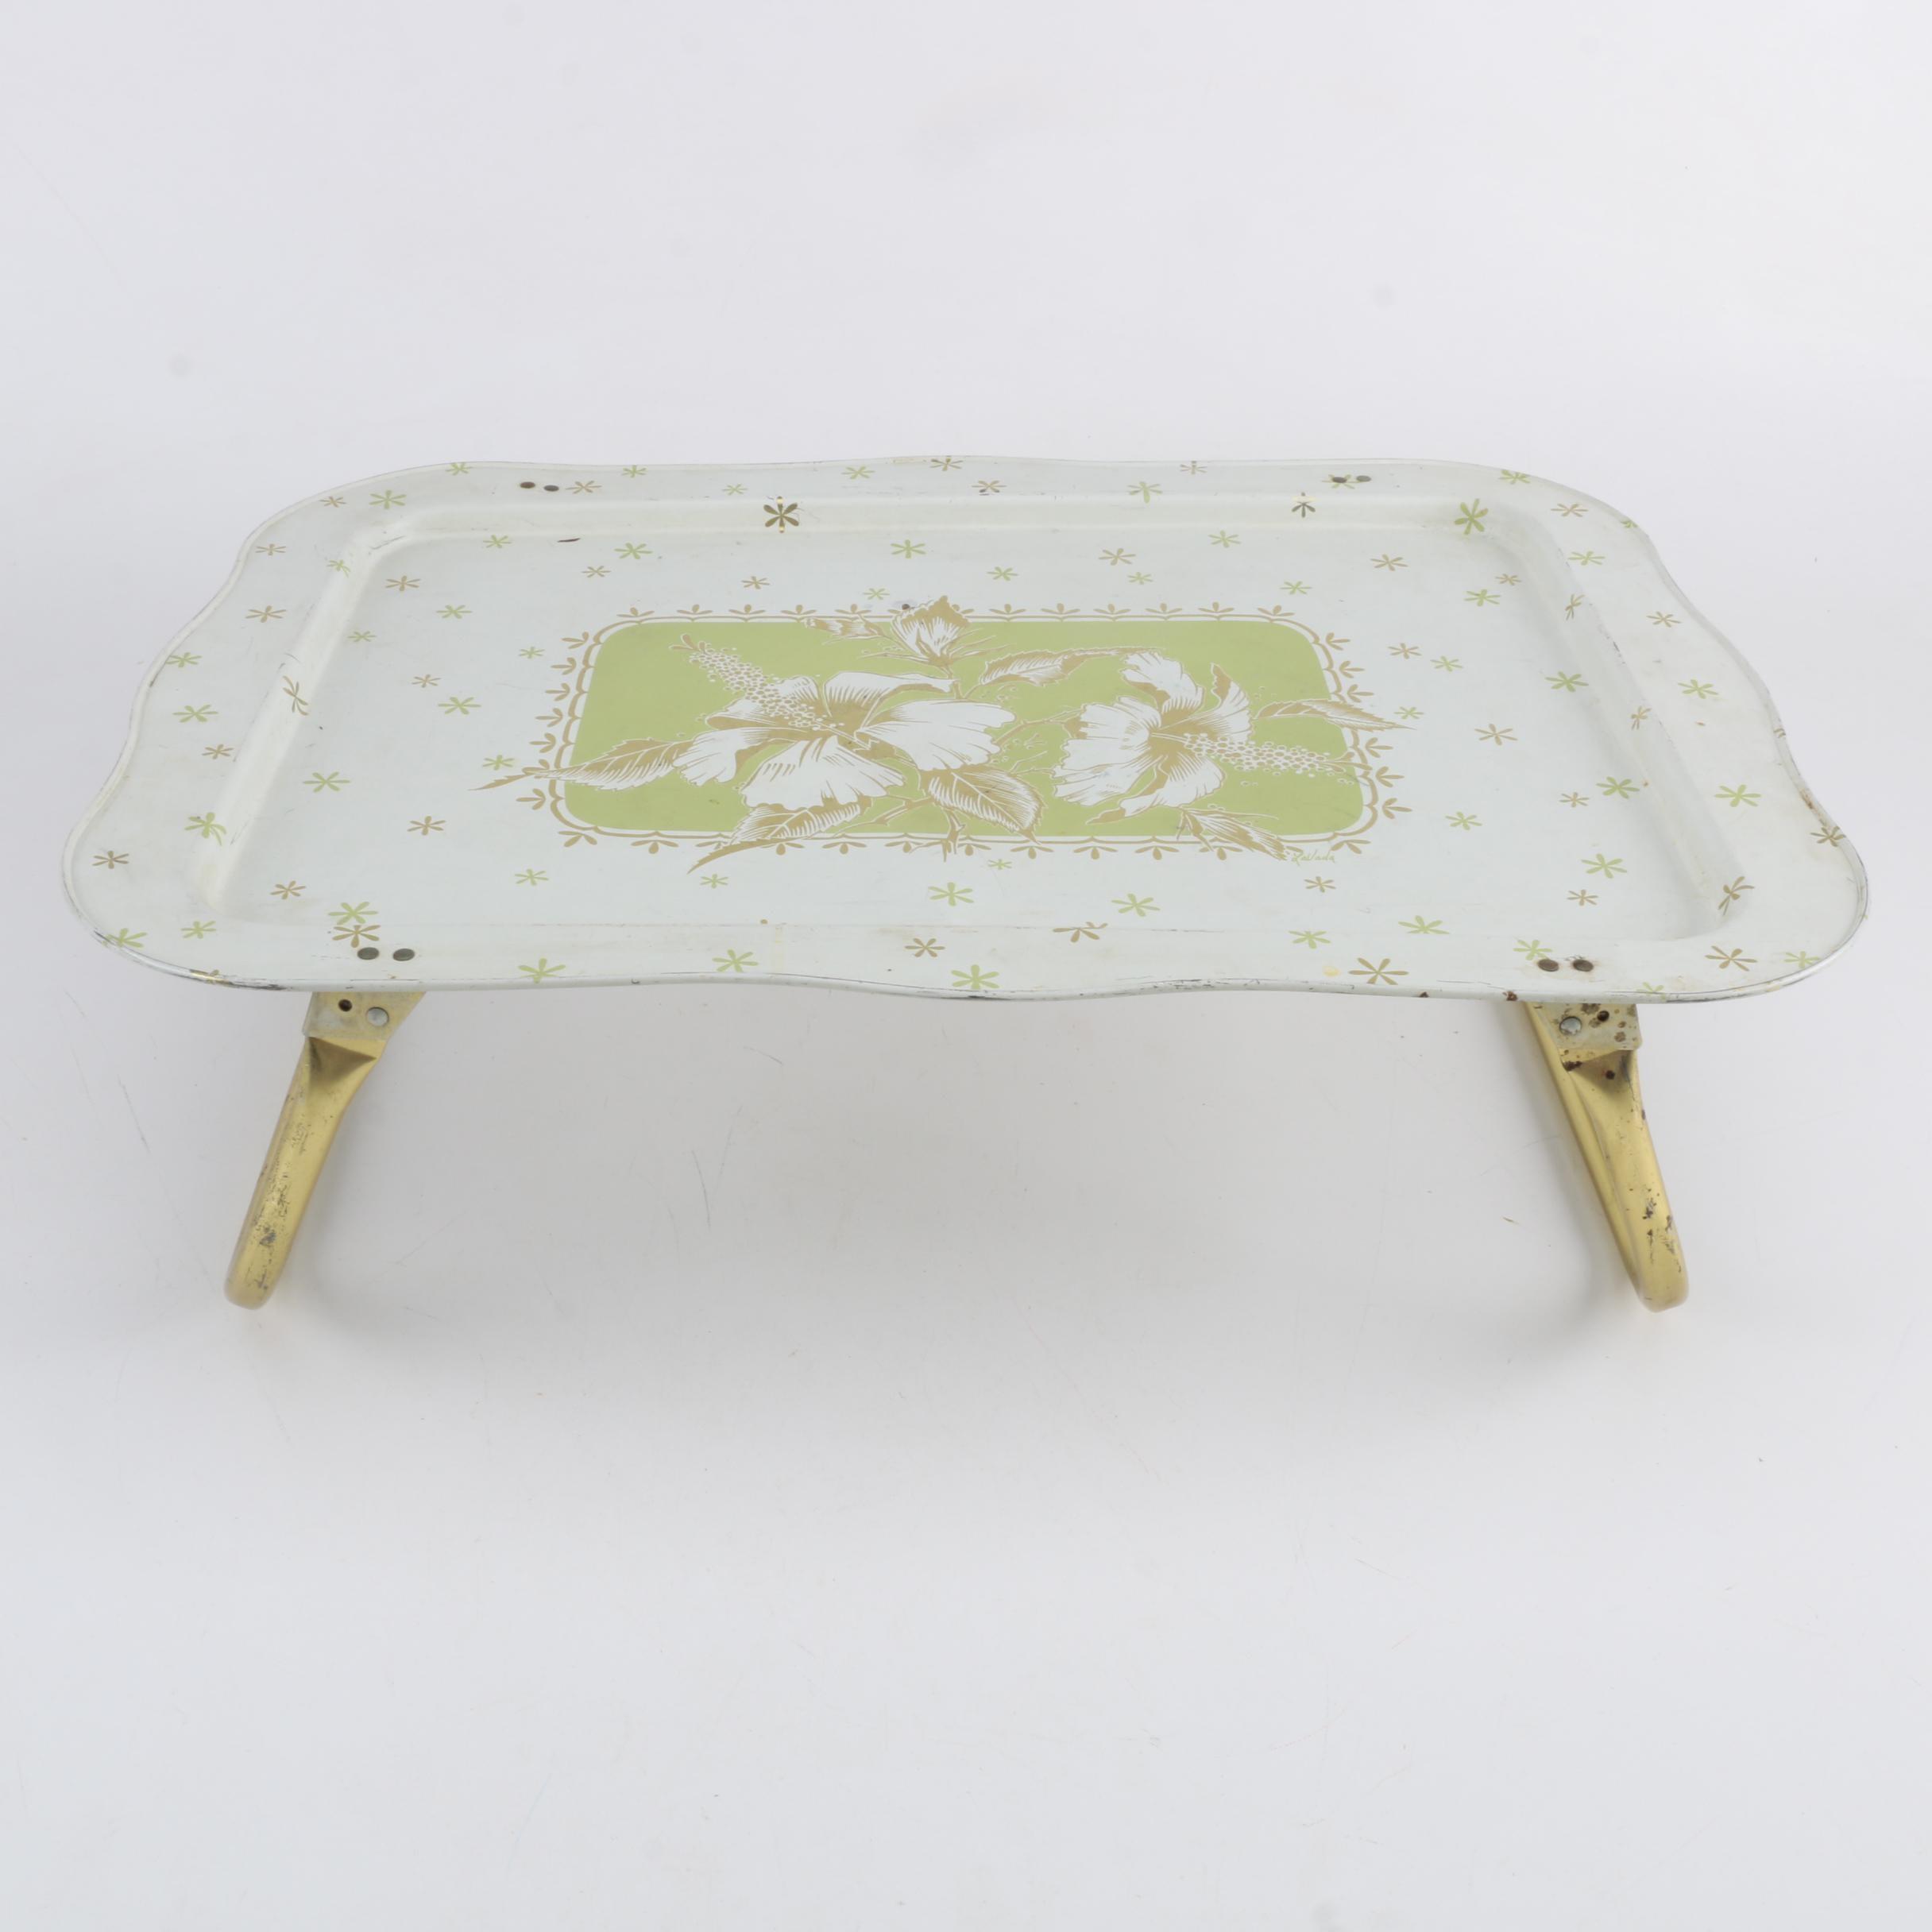 Vintage LaVada Folding Lap Tray